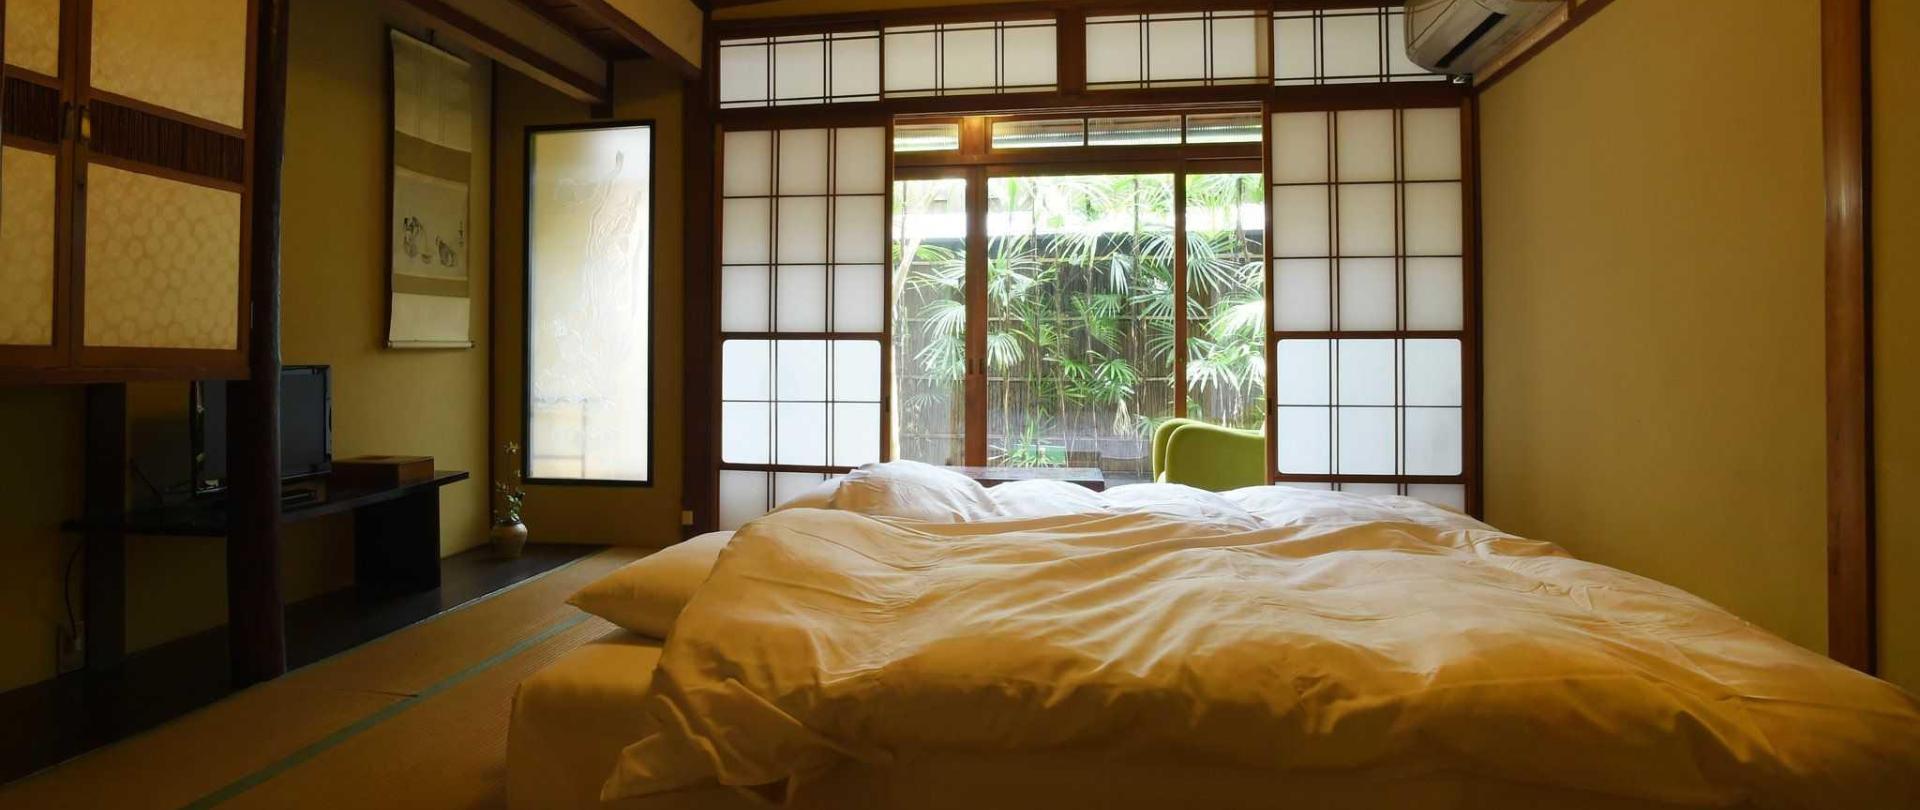 Traditional Kyoto Inn serving Kyoto cuisine IZYASU - Former Ryokan Izuyasui